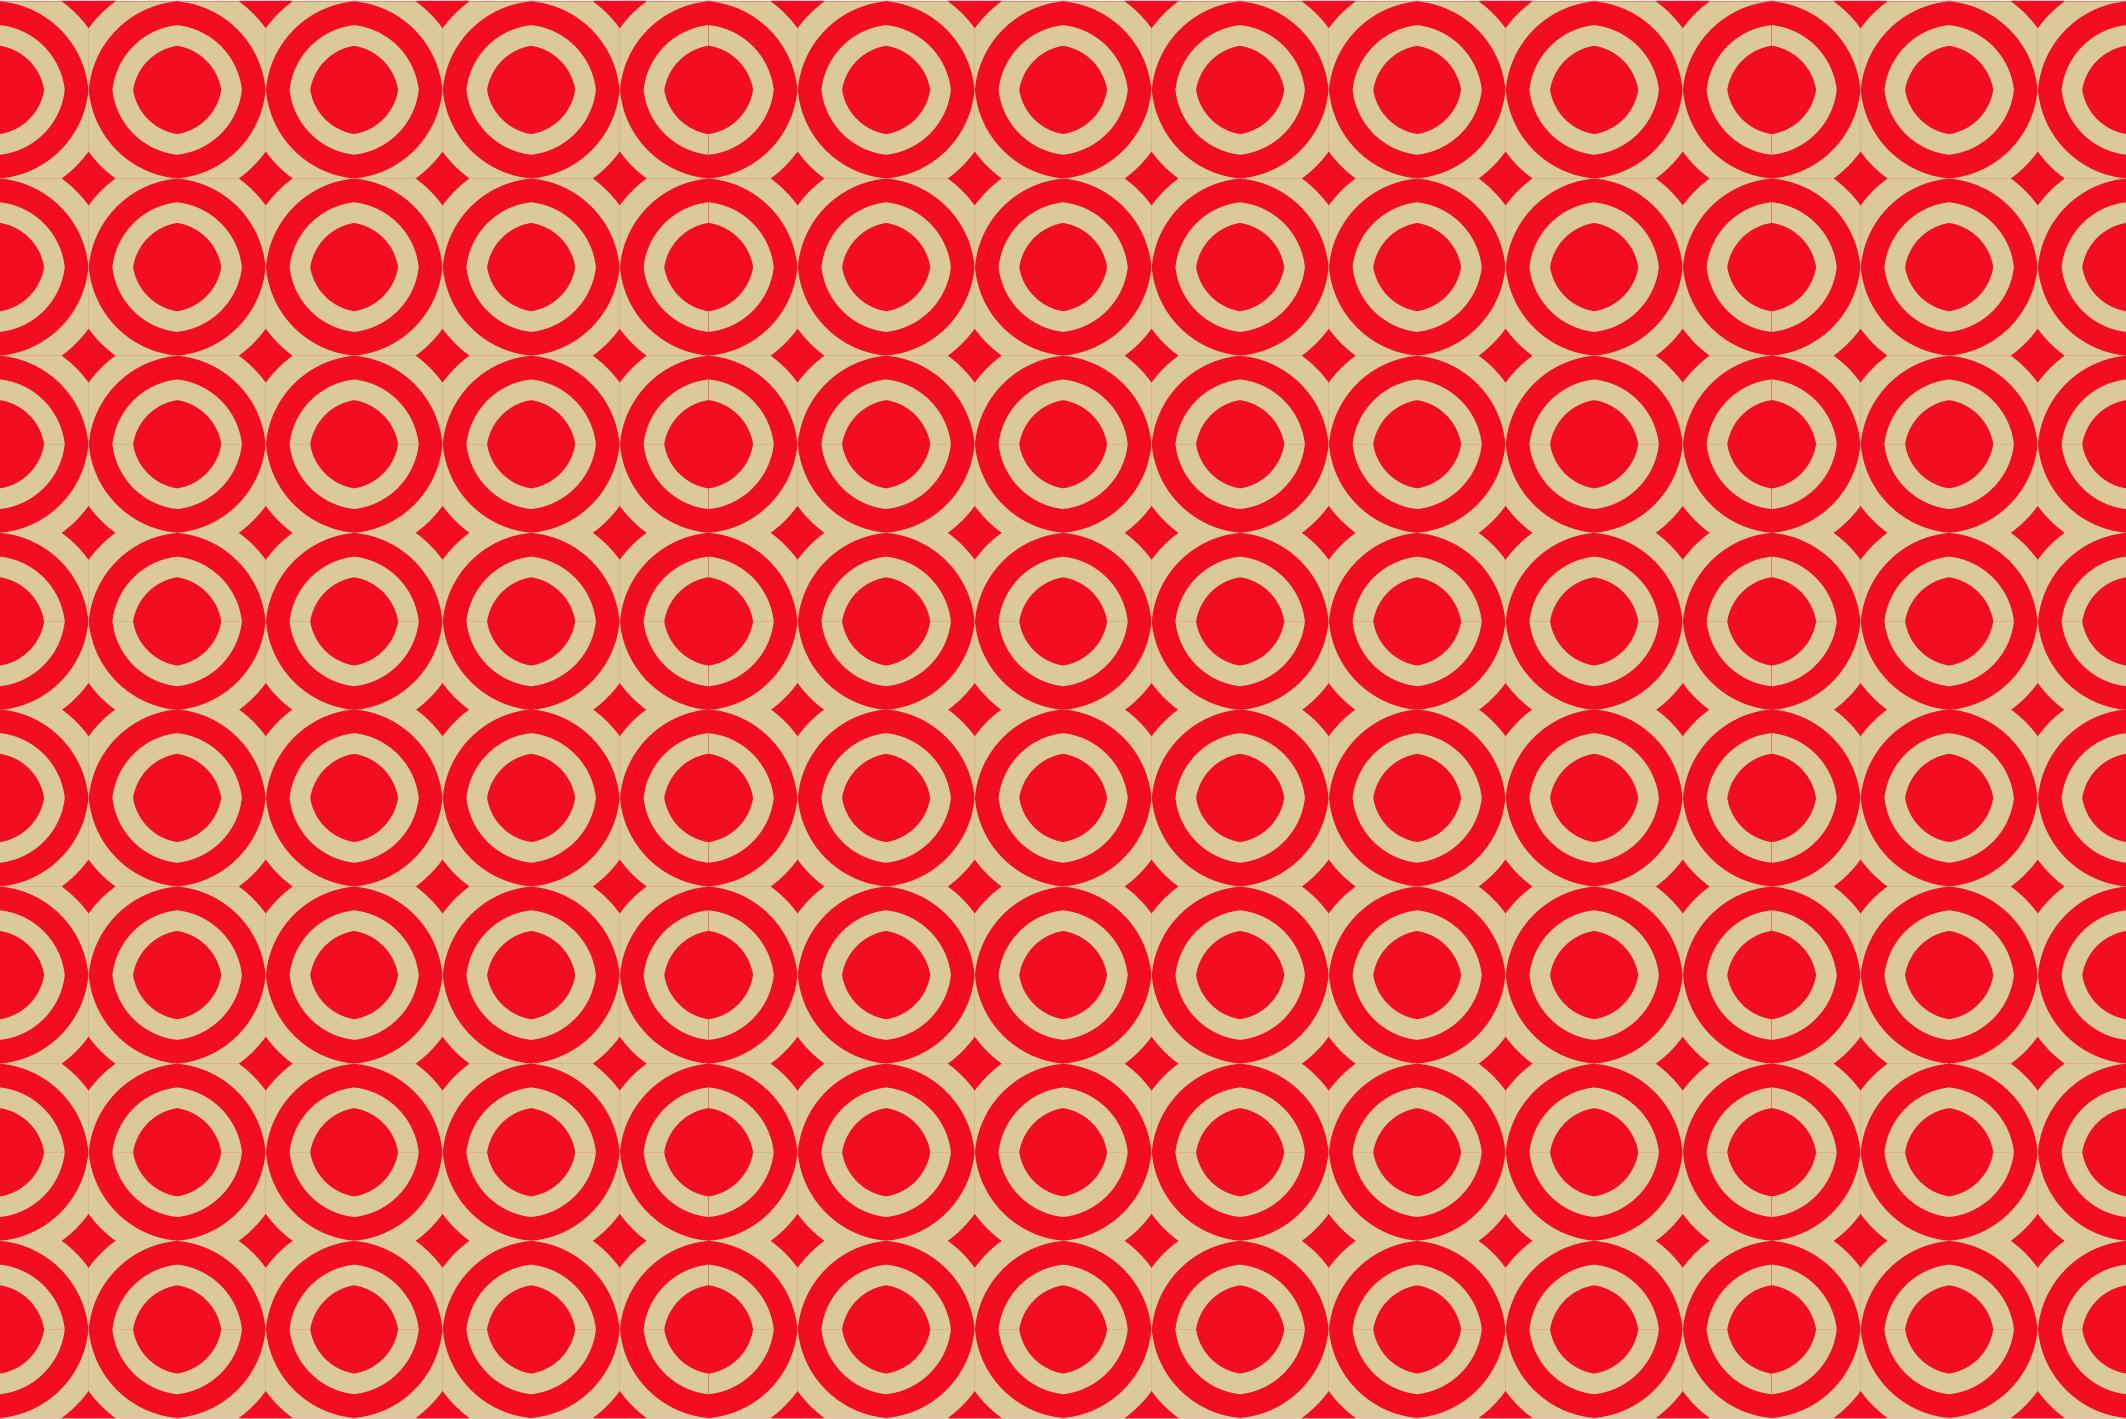 Luxury ornamental seamless patterns. example image 3